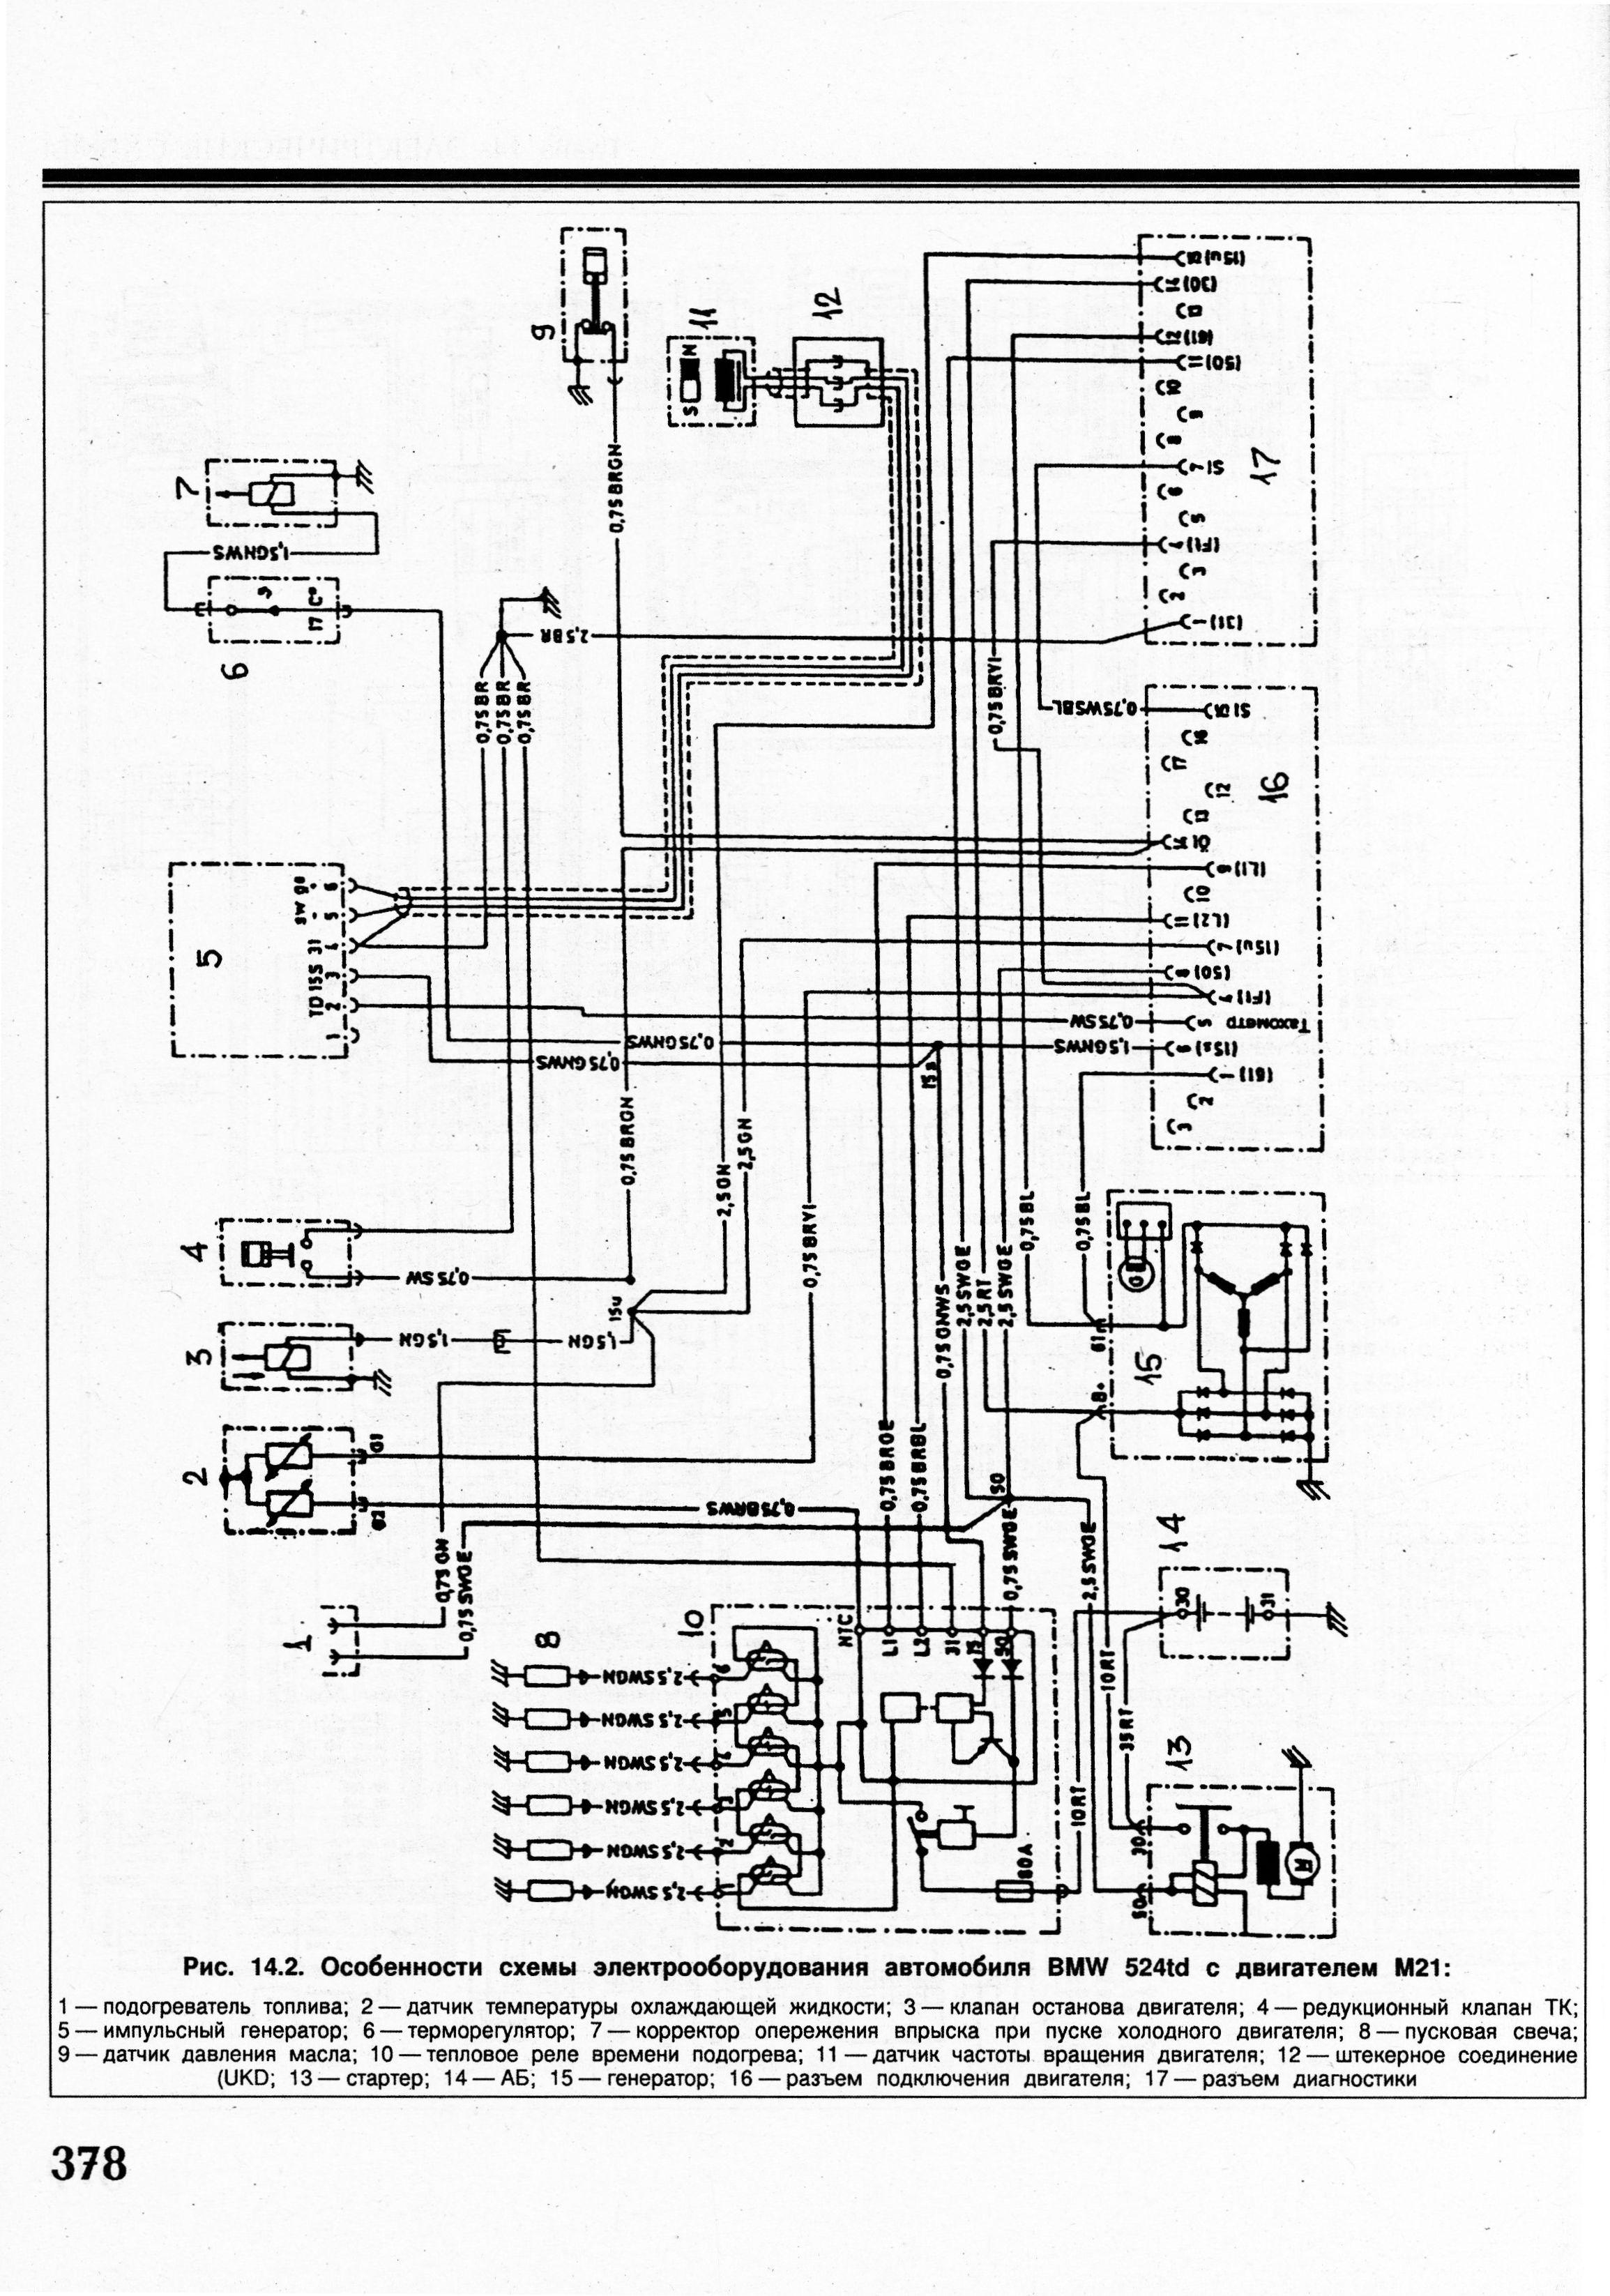 схема электрооборудования на bmw 5 для е34, м51 tds